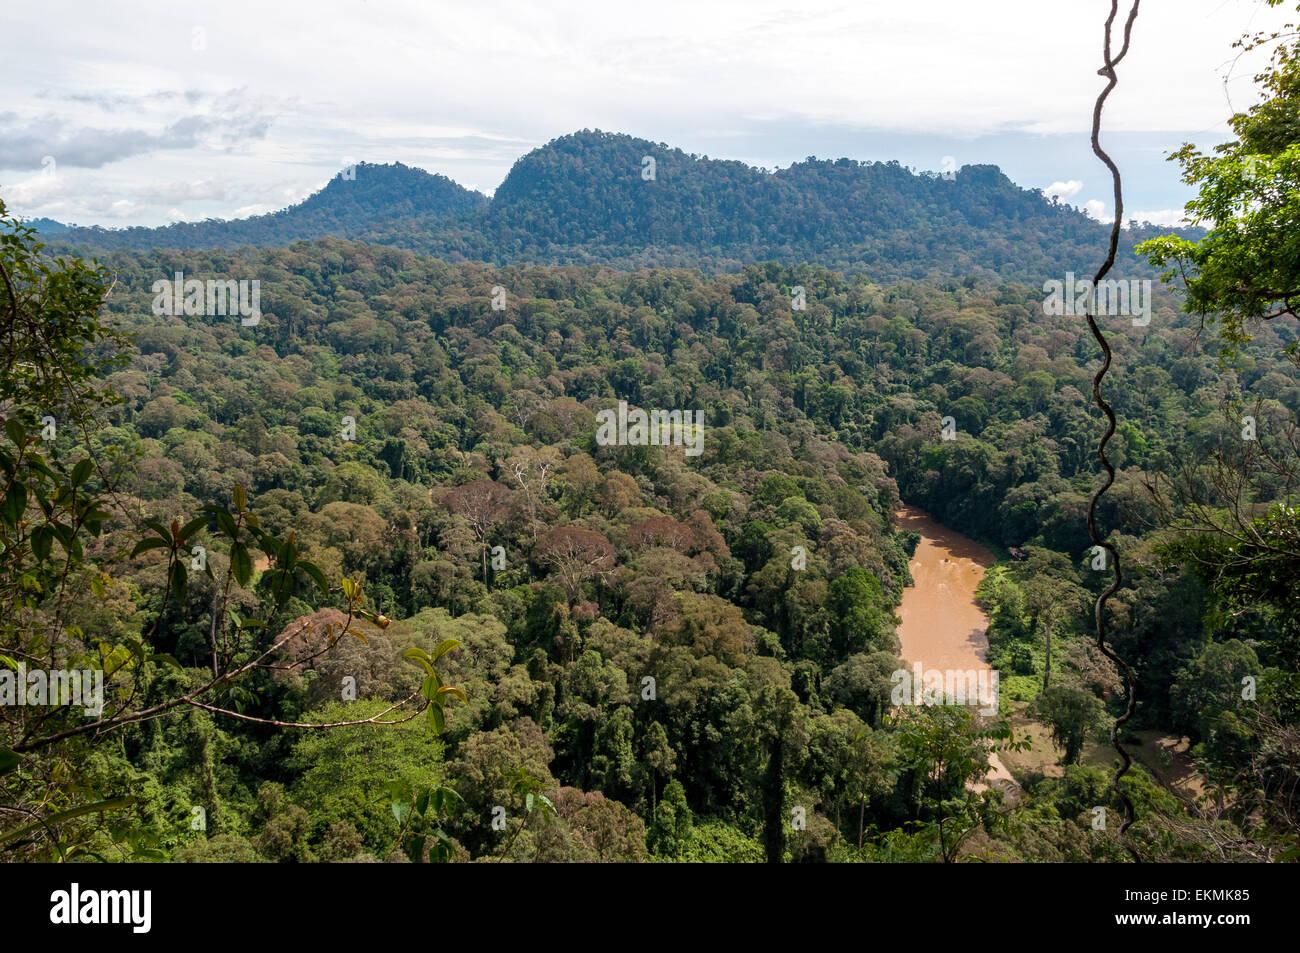 view-of-the-borneo-rainforest-sabah-malaysia-EKMK85.jpg